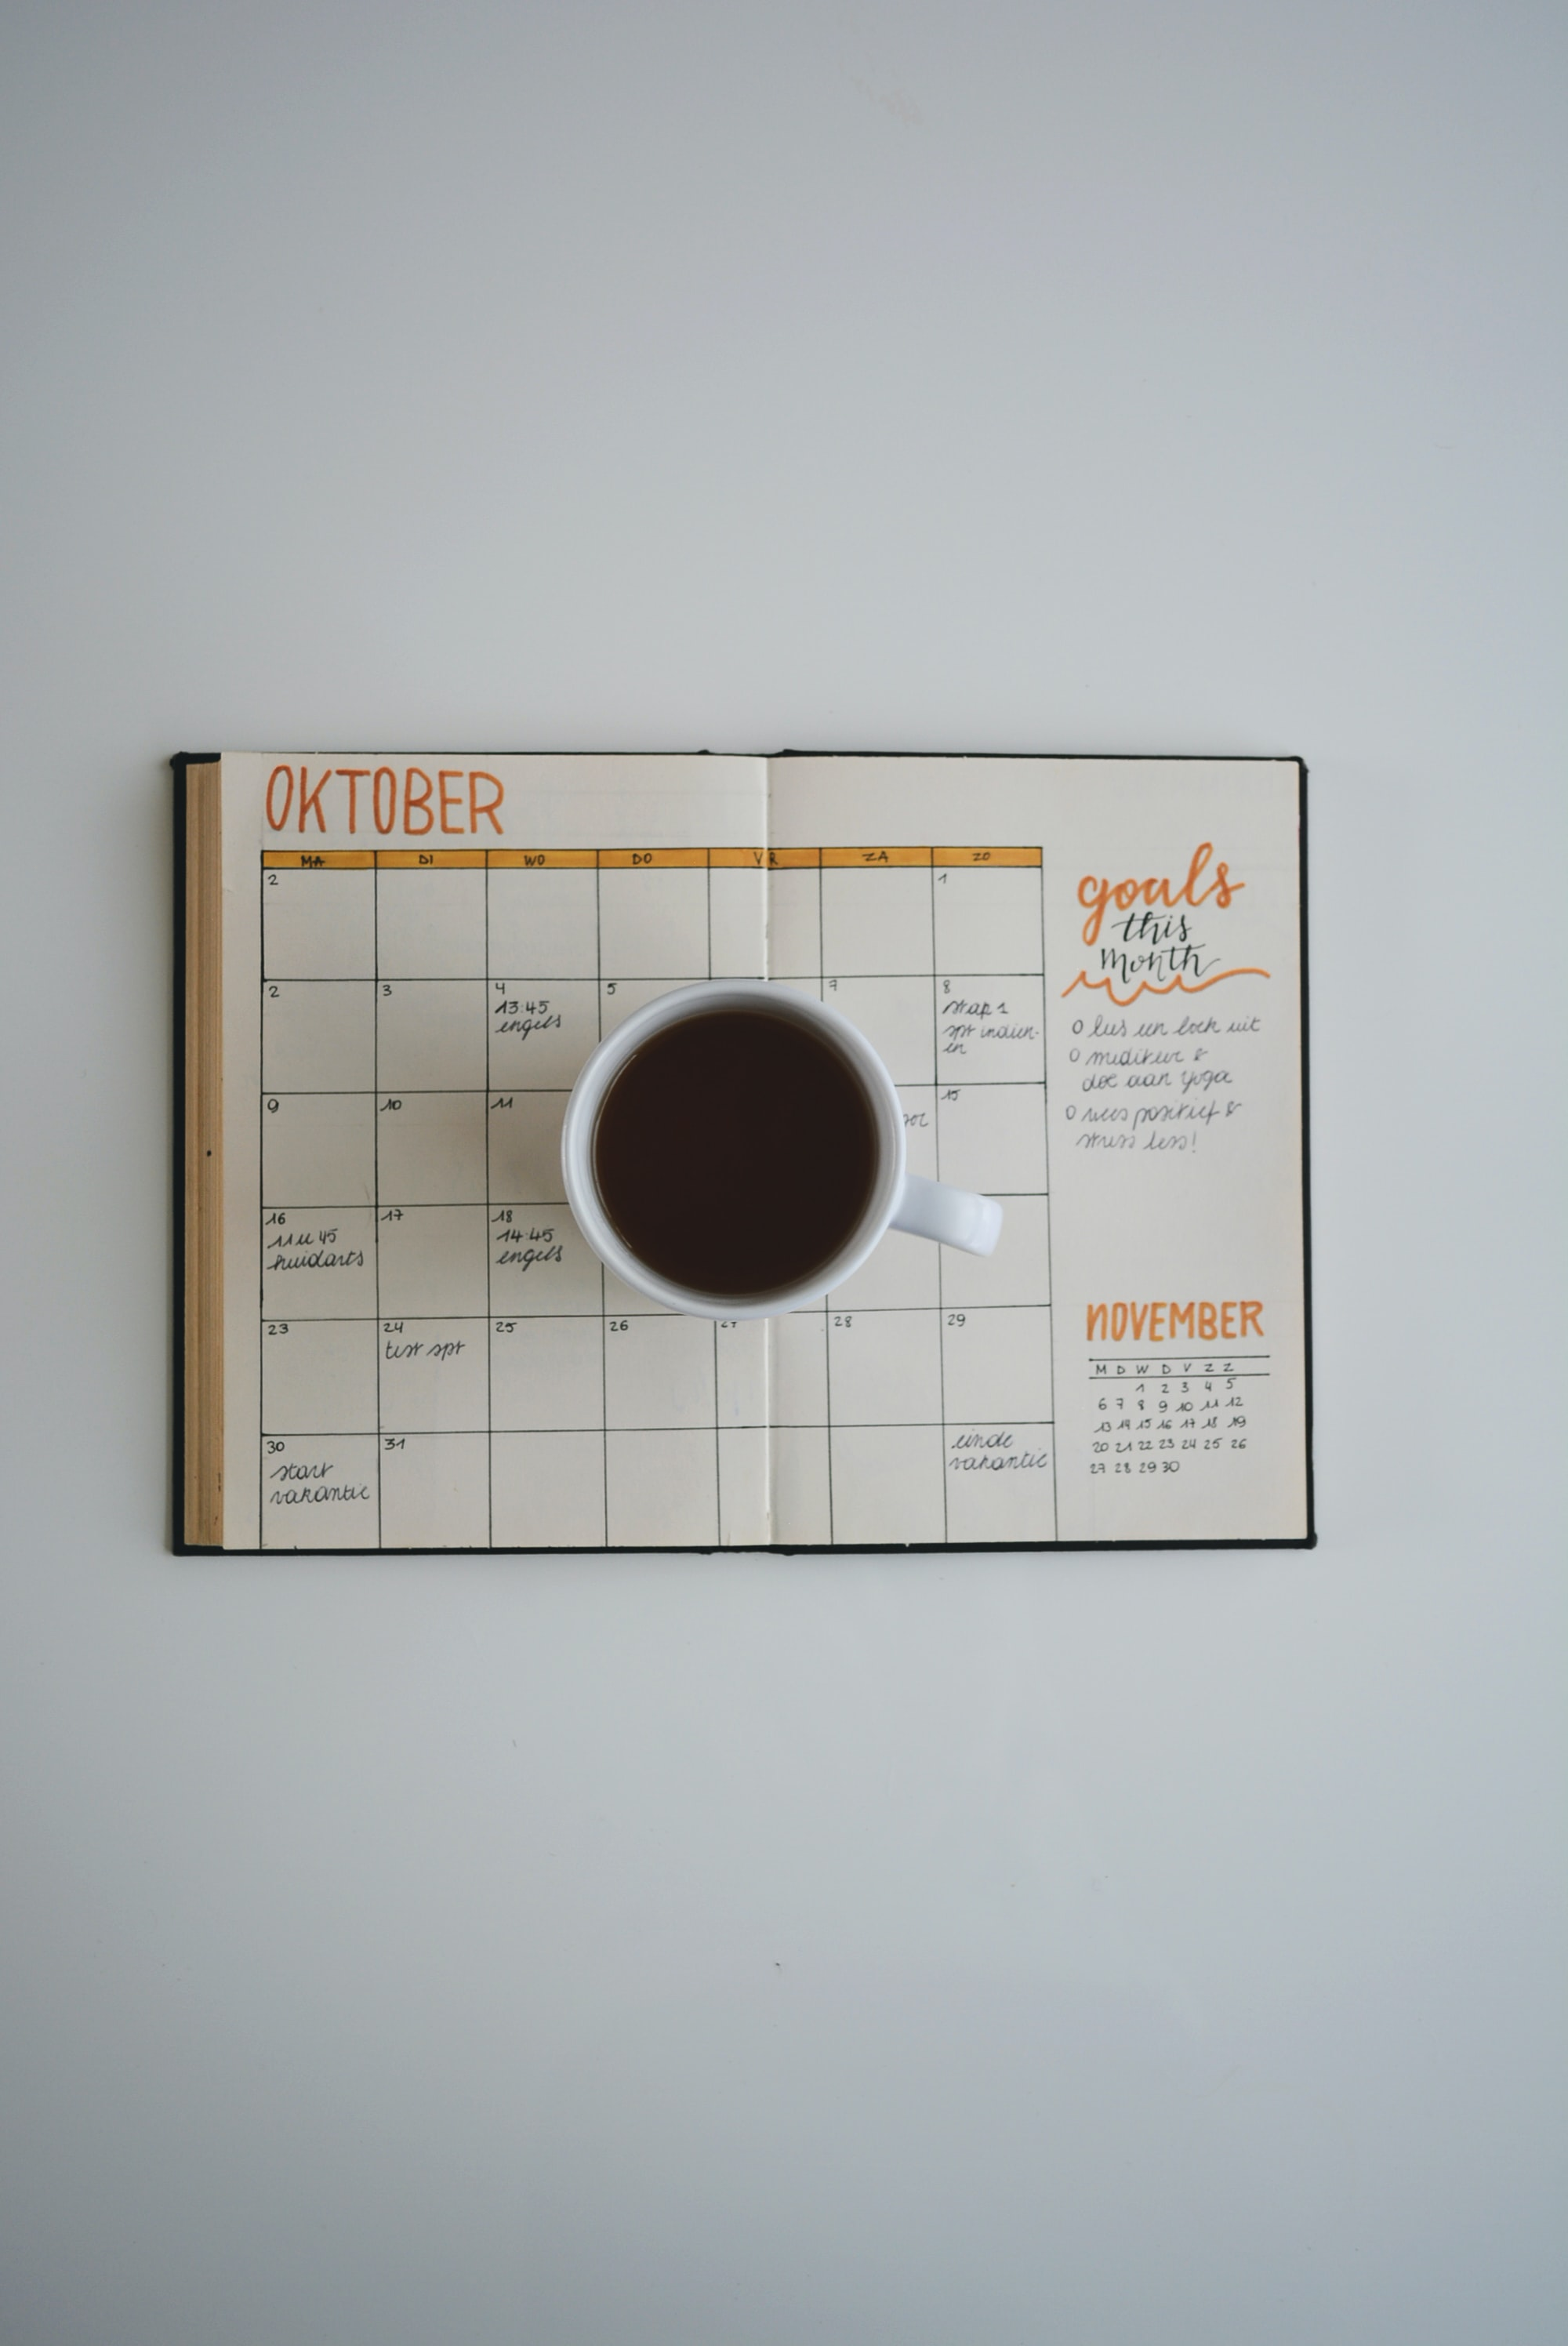 white coffee mug on calendar at october